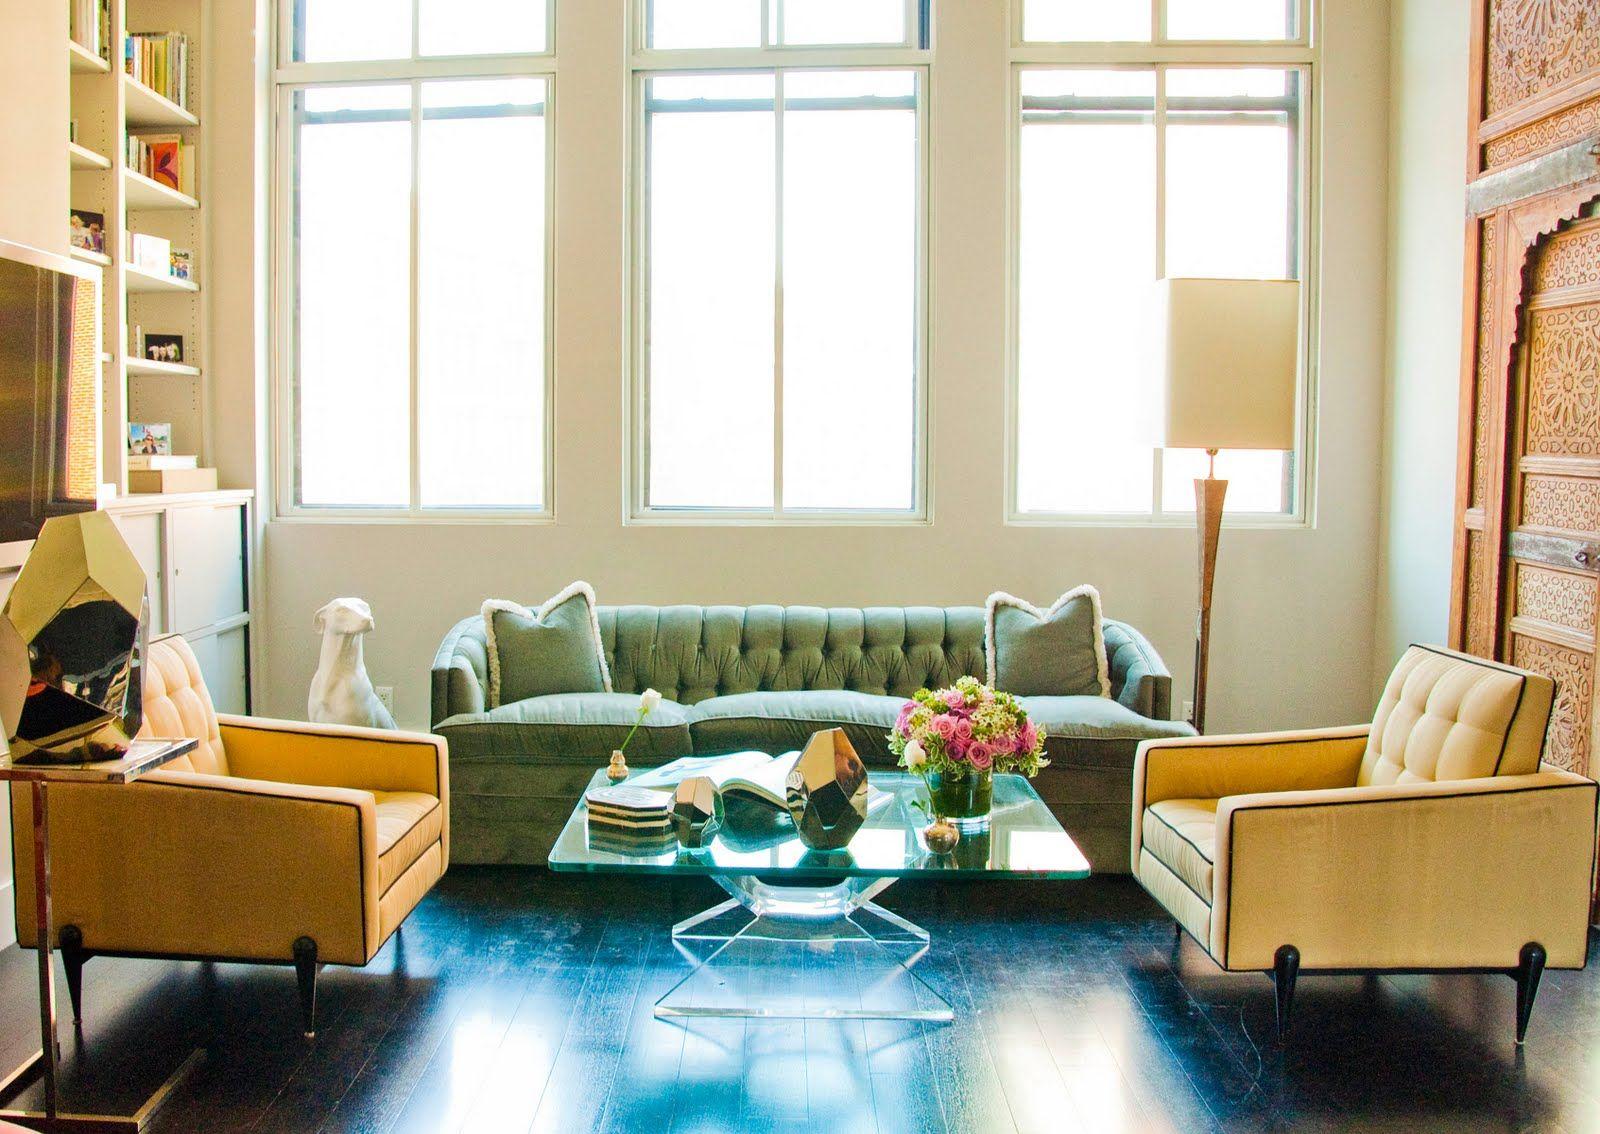 Jessica Stam S New York Apartment Via Vogue Photographed By Claiborne Swanson Frank